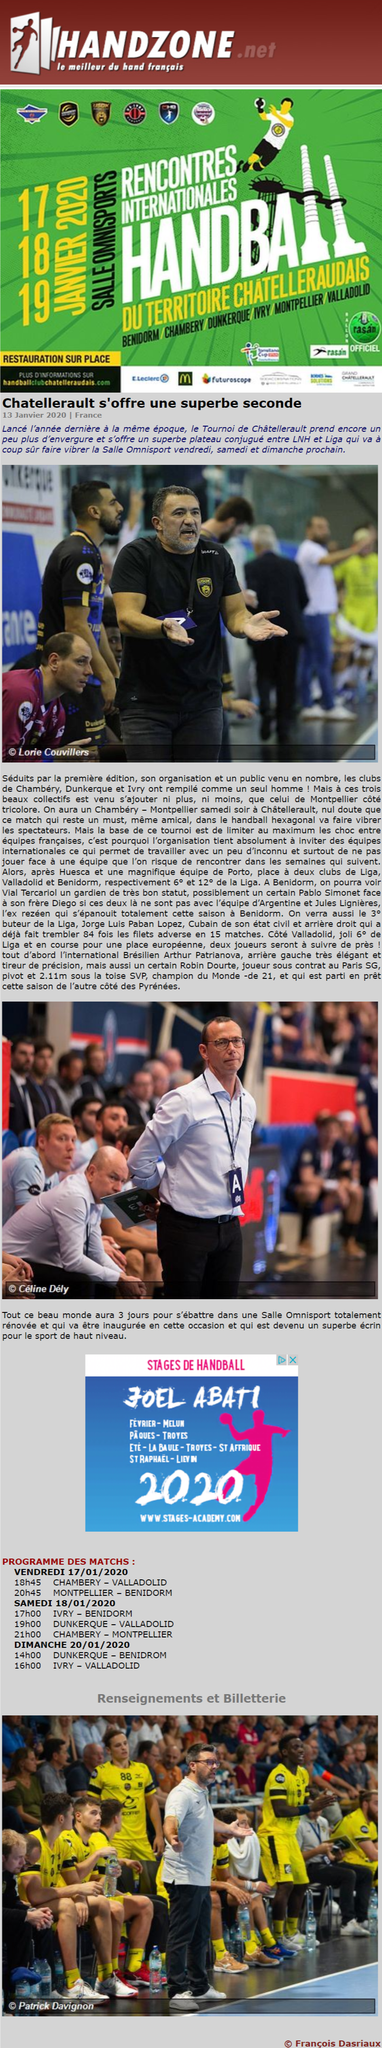 Handzone, article du 13 janvier 2020